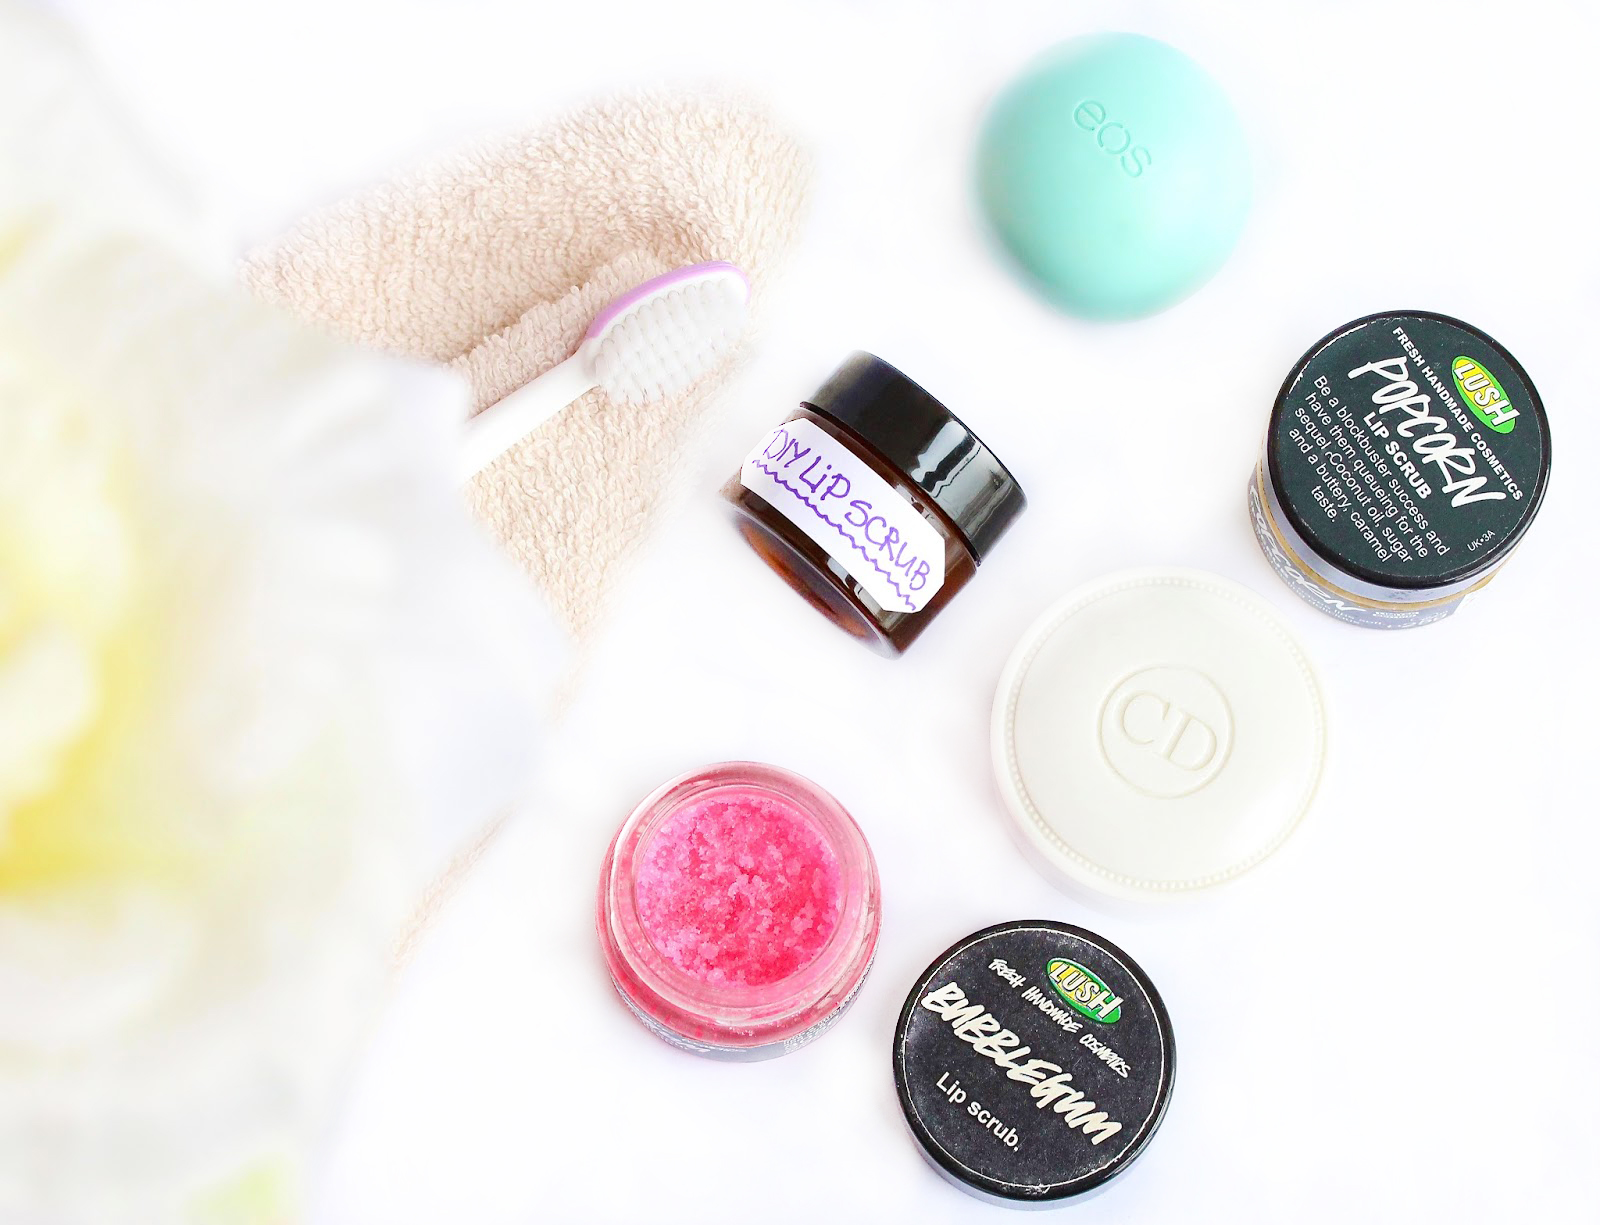 Lip Exfoliation Remedies